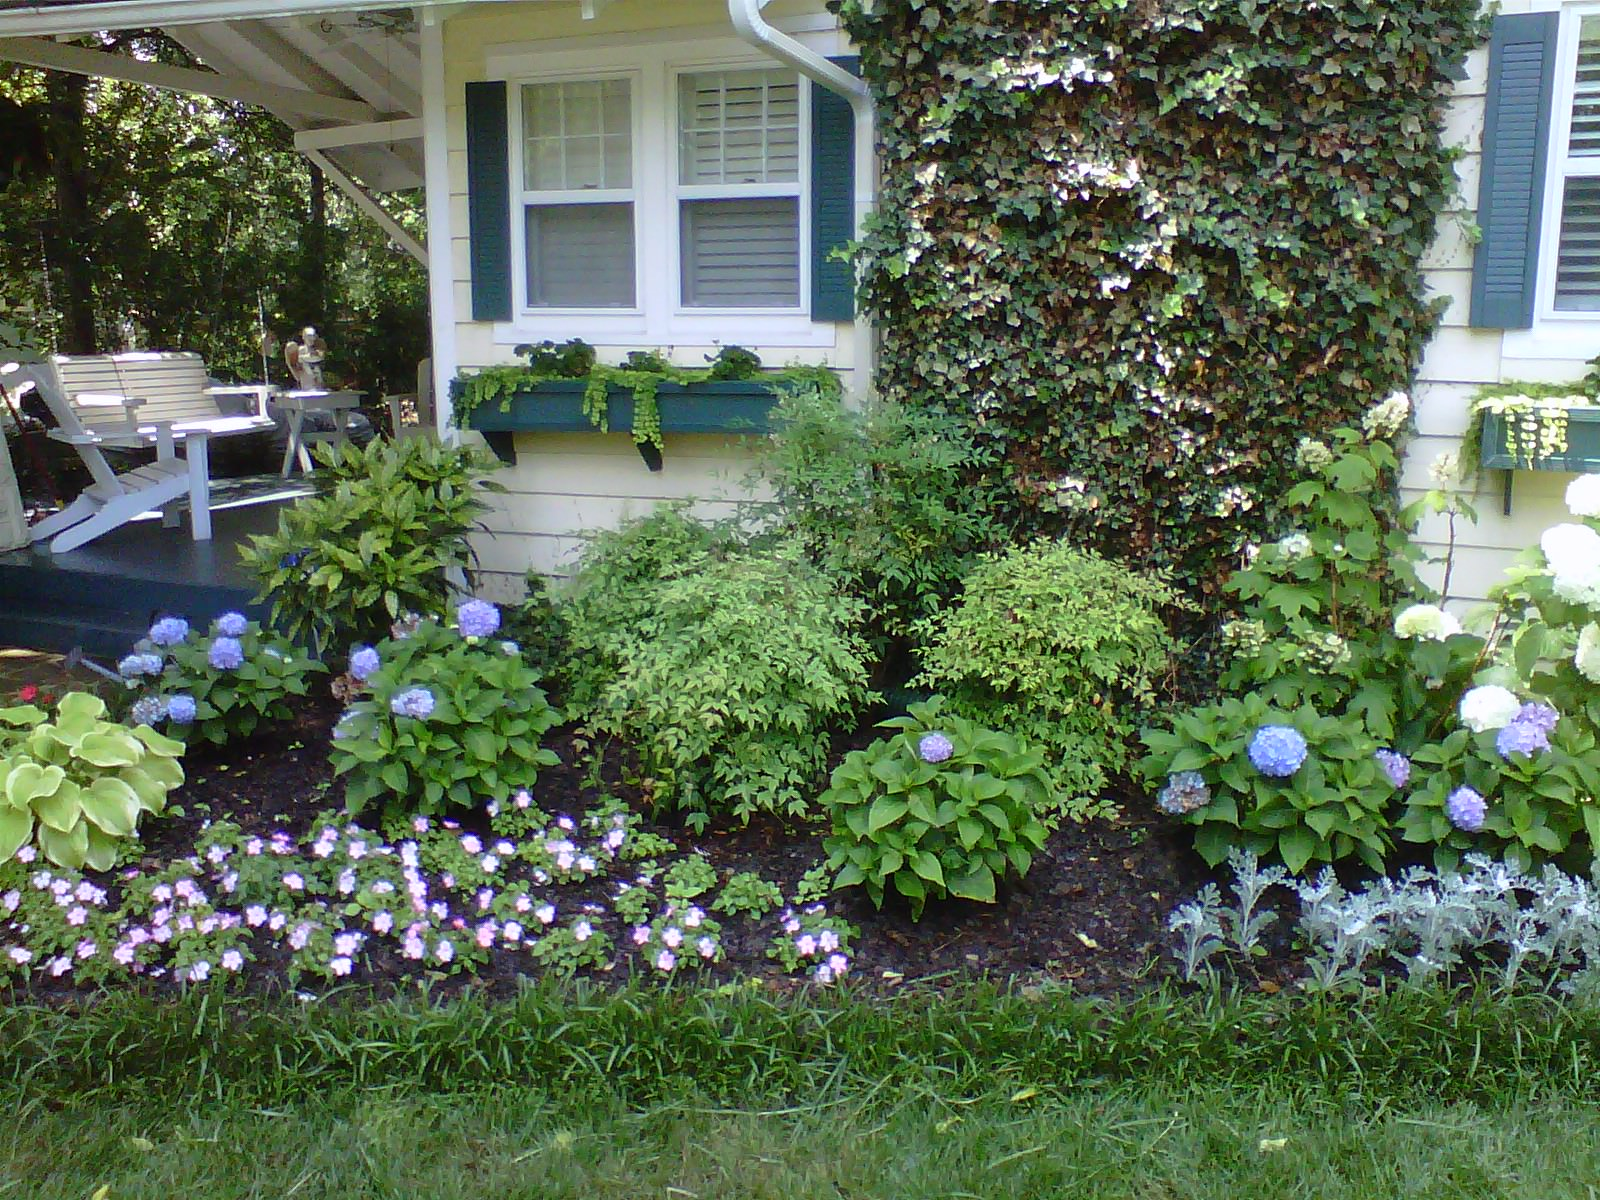 Justin Stelter Landscape Gardening - Cottage Garden - 12465153055_a157d811bc_o.jpg